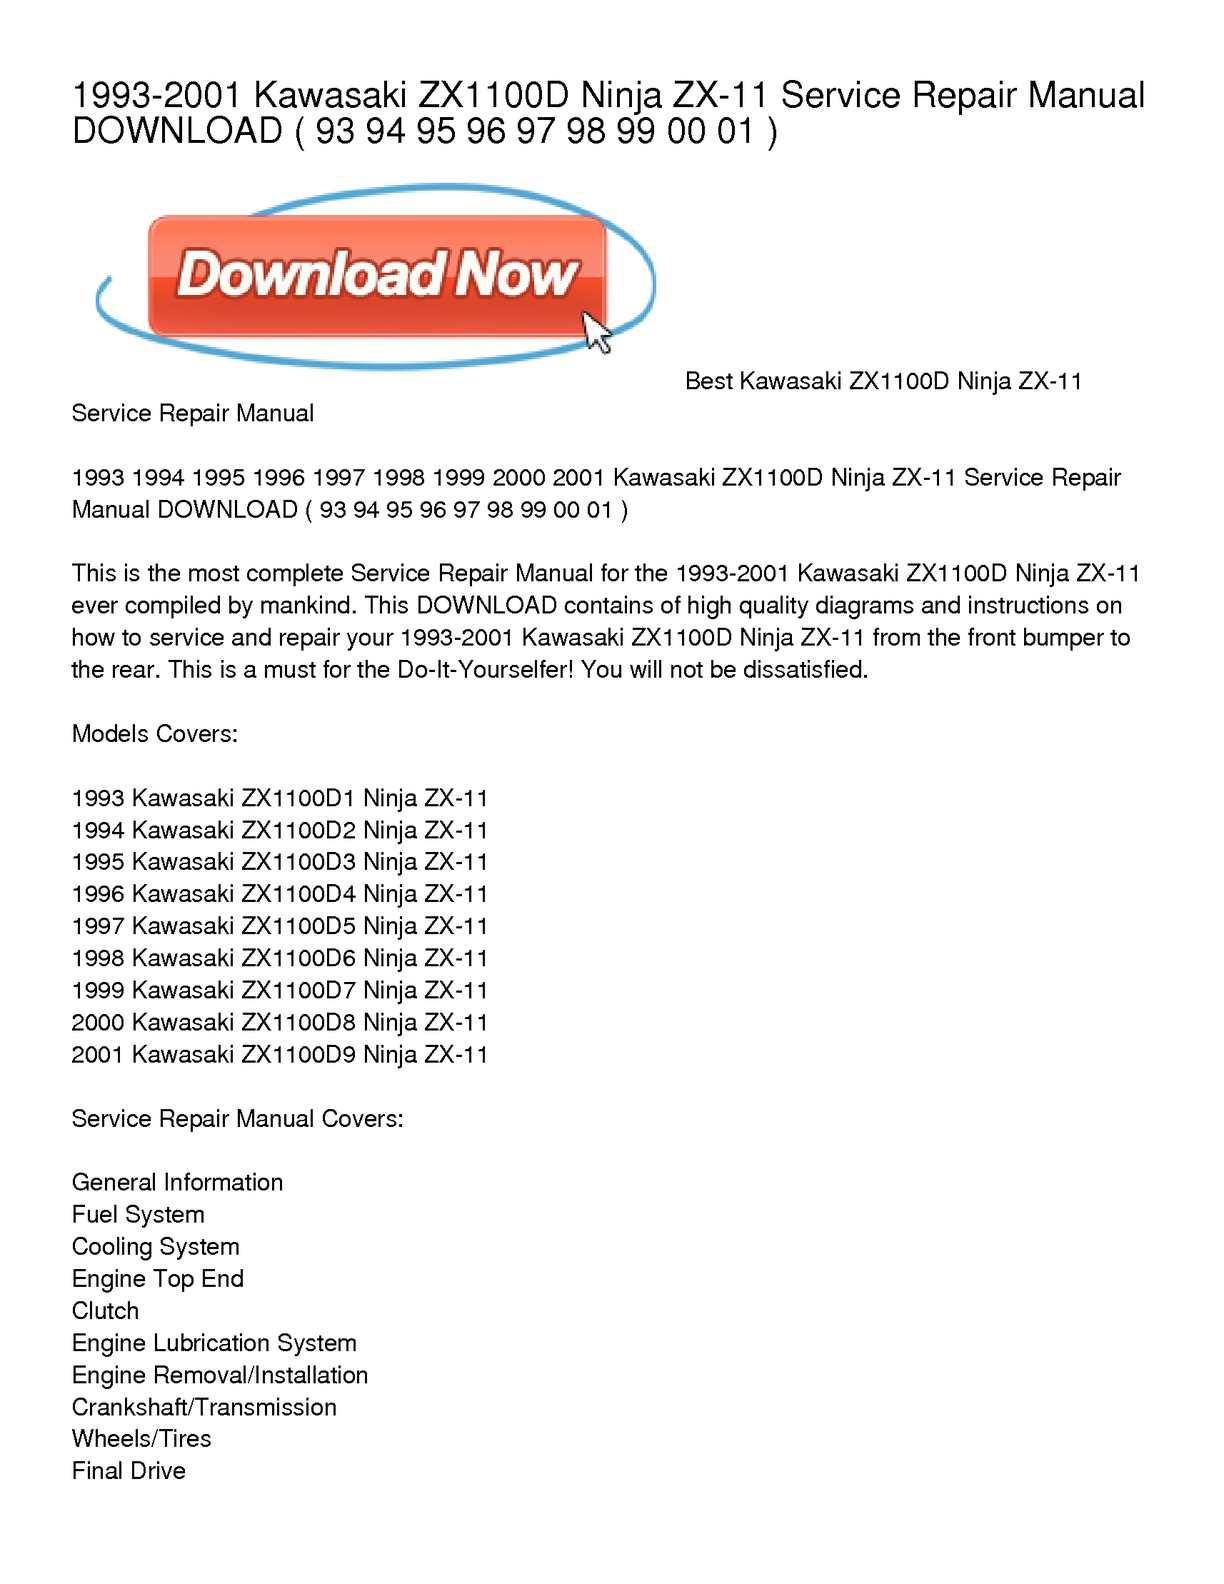 hight resolution of 1993 2001 kawasaki zx1100d ninja zx 11 service repair manual download